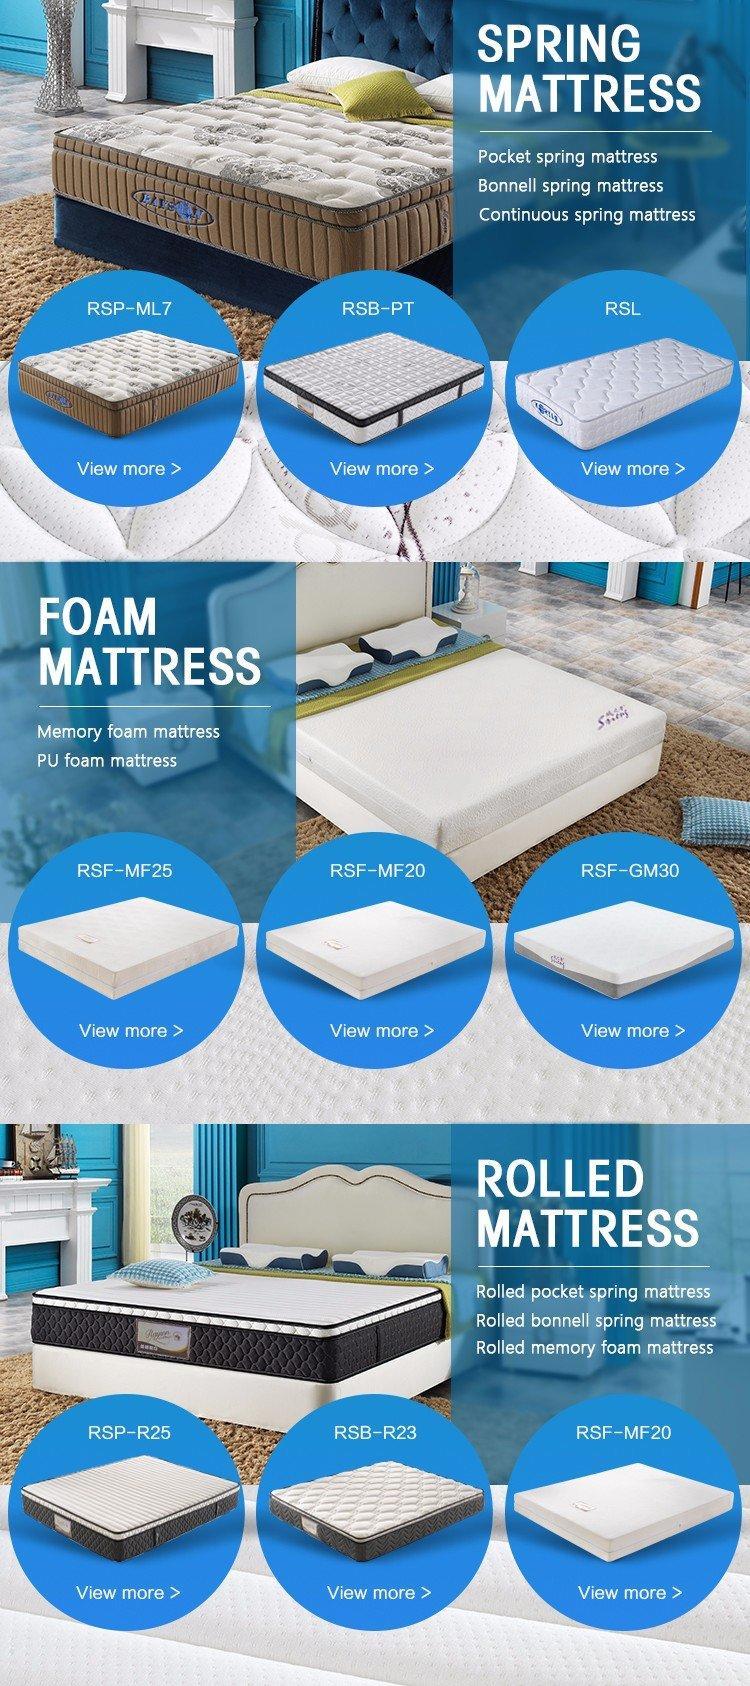 Hot 3 Star Hotel Mattress posture Rayson Mattress Brand